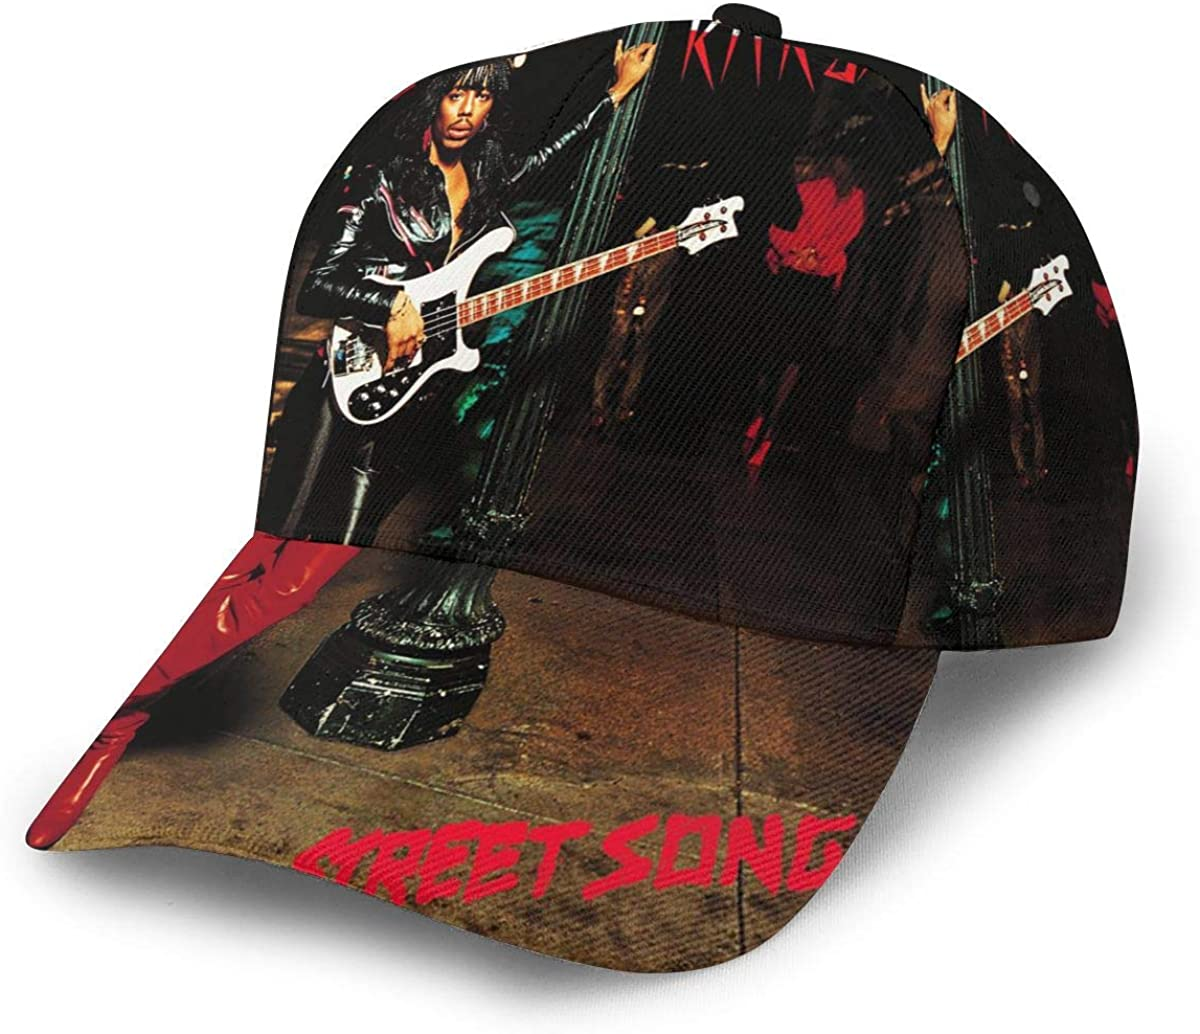 WilliamWButler Rick James Baseball Cap Trucker Hat Adjustable Fashion Breathable Sports Caps Unisex